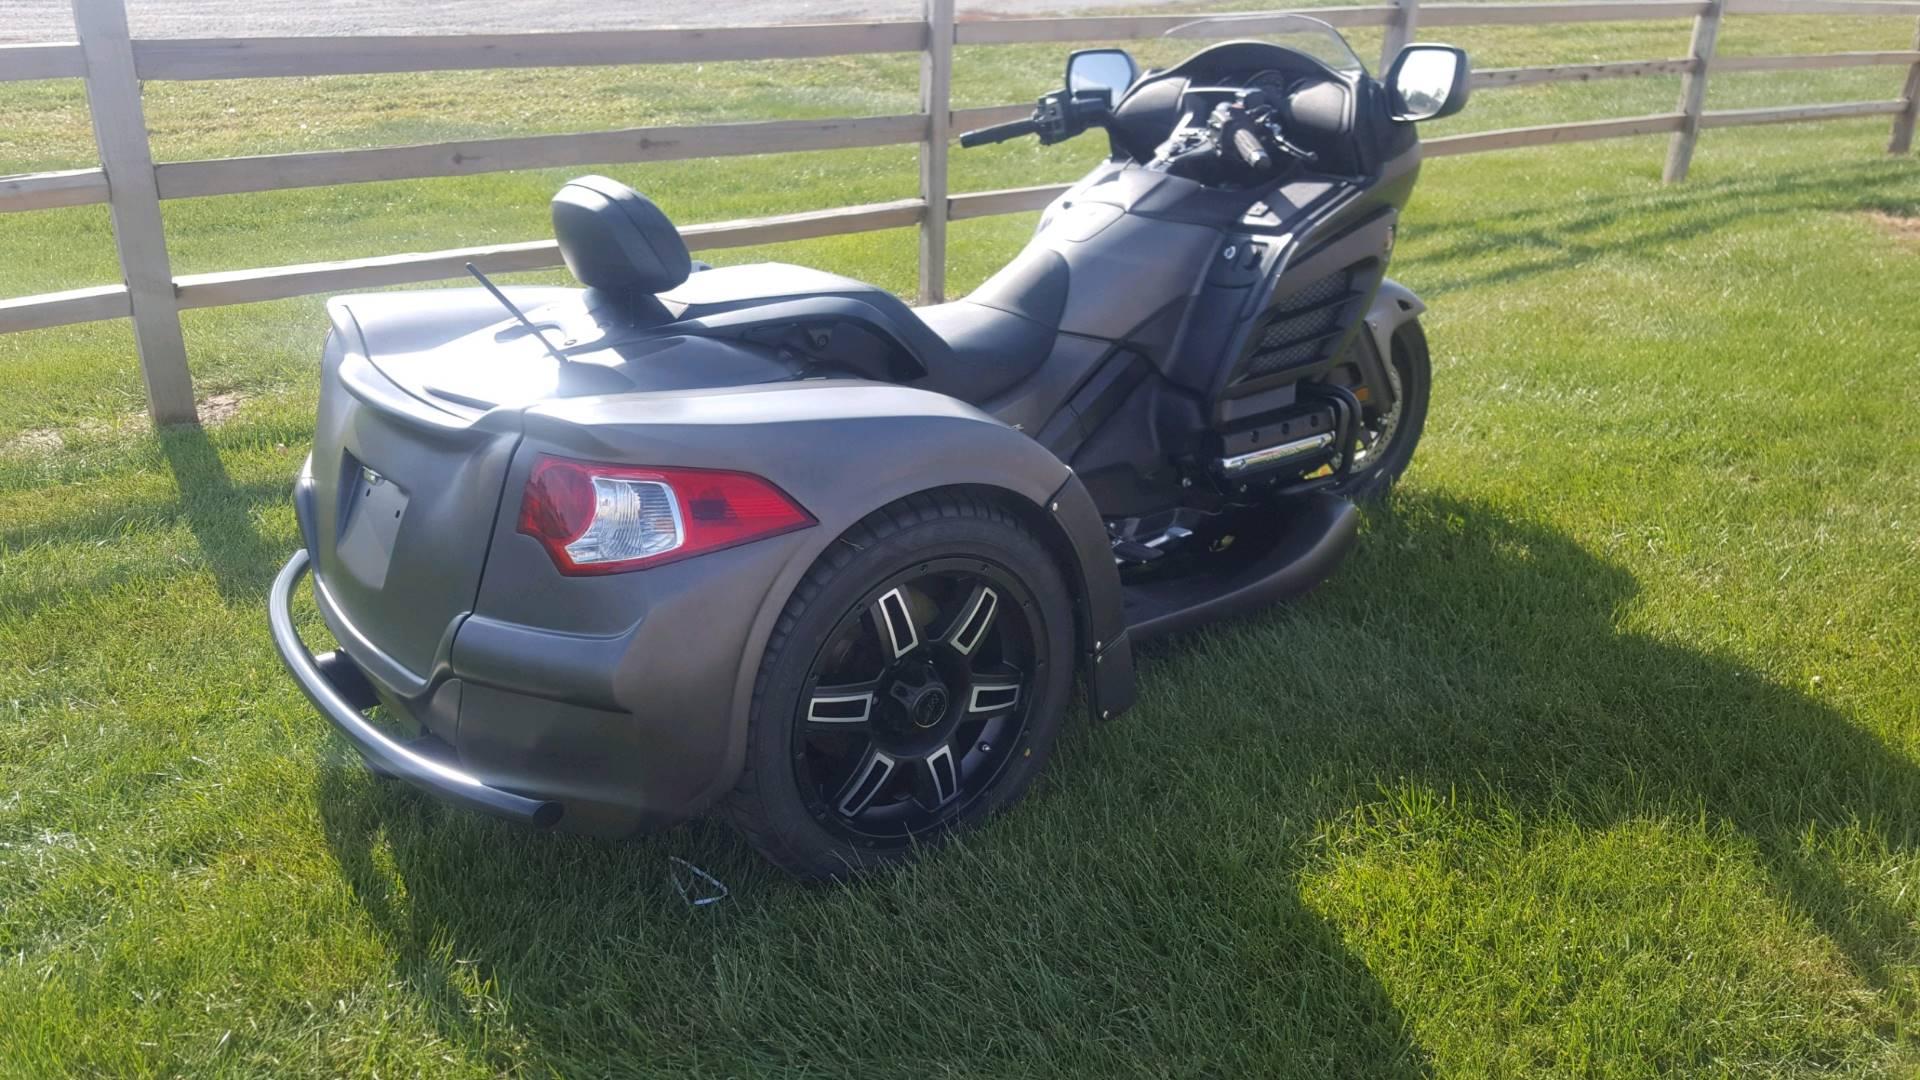 2016 Motor Trike Gl1800 F6b In Roca Nebraska Photo 1